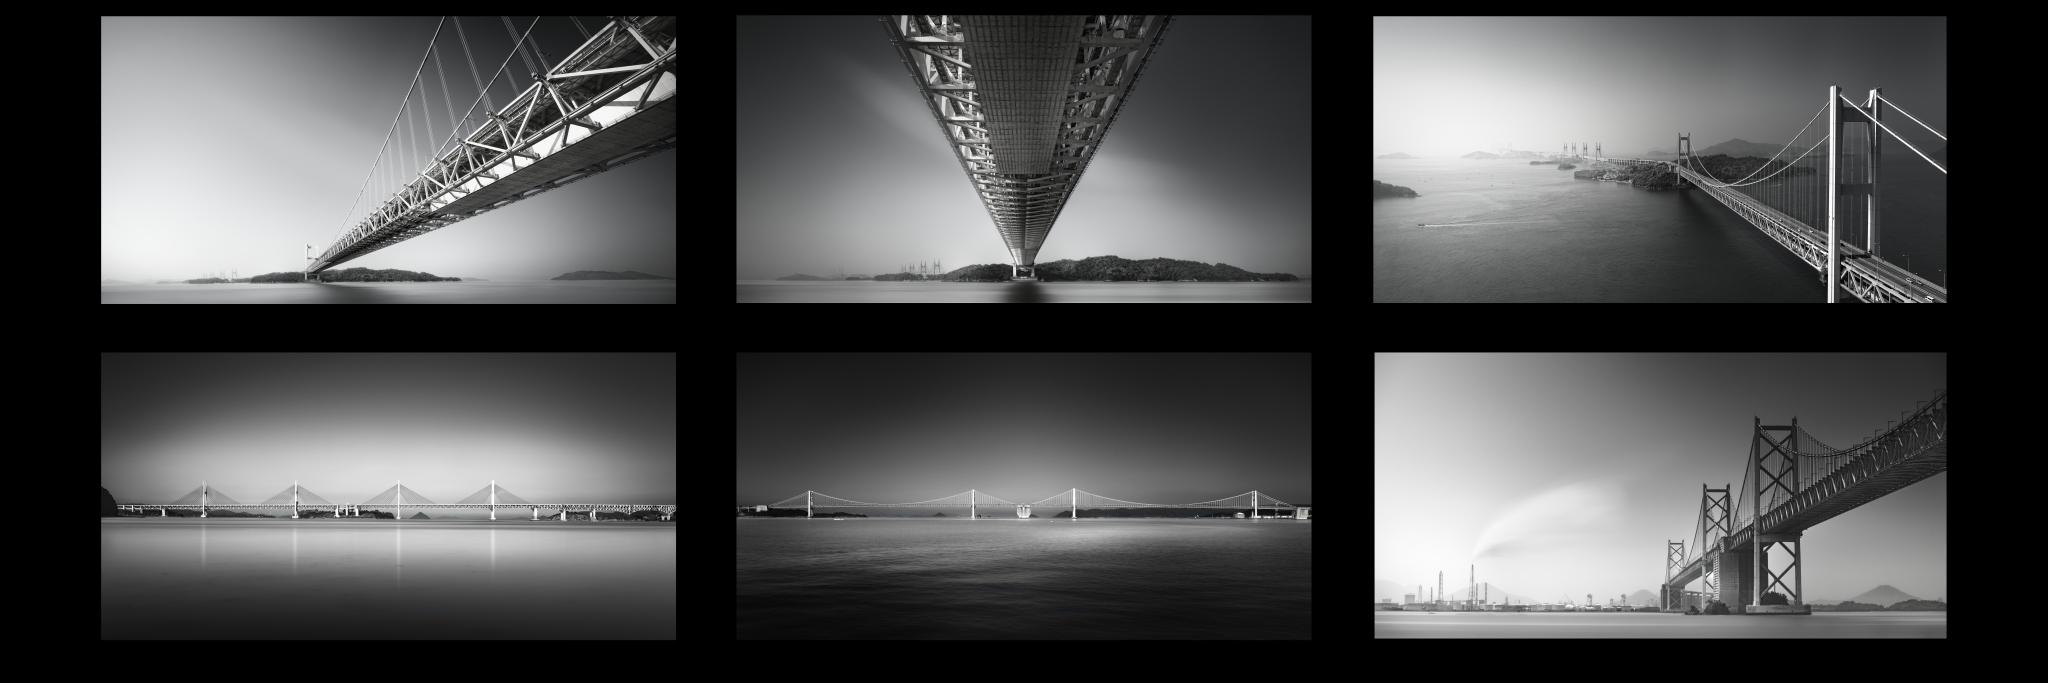 The Great Seto Bridge